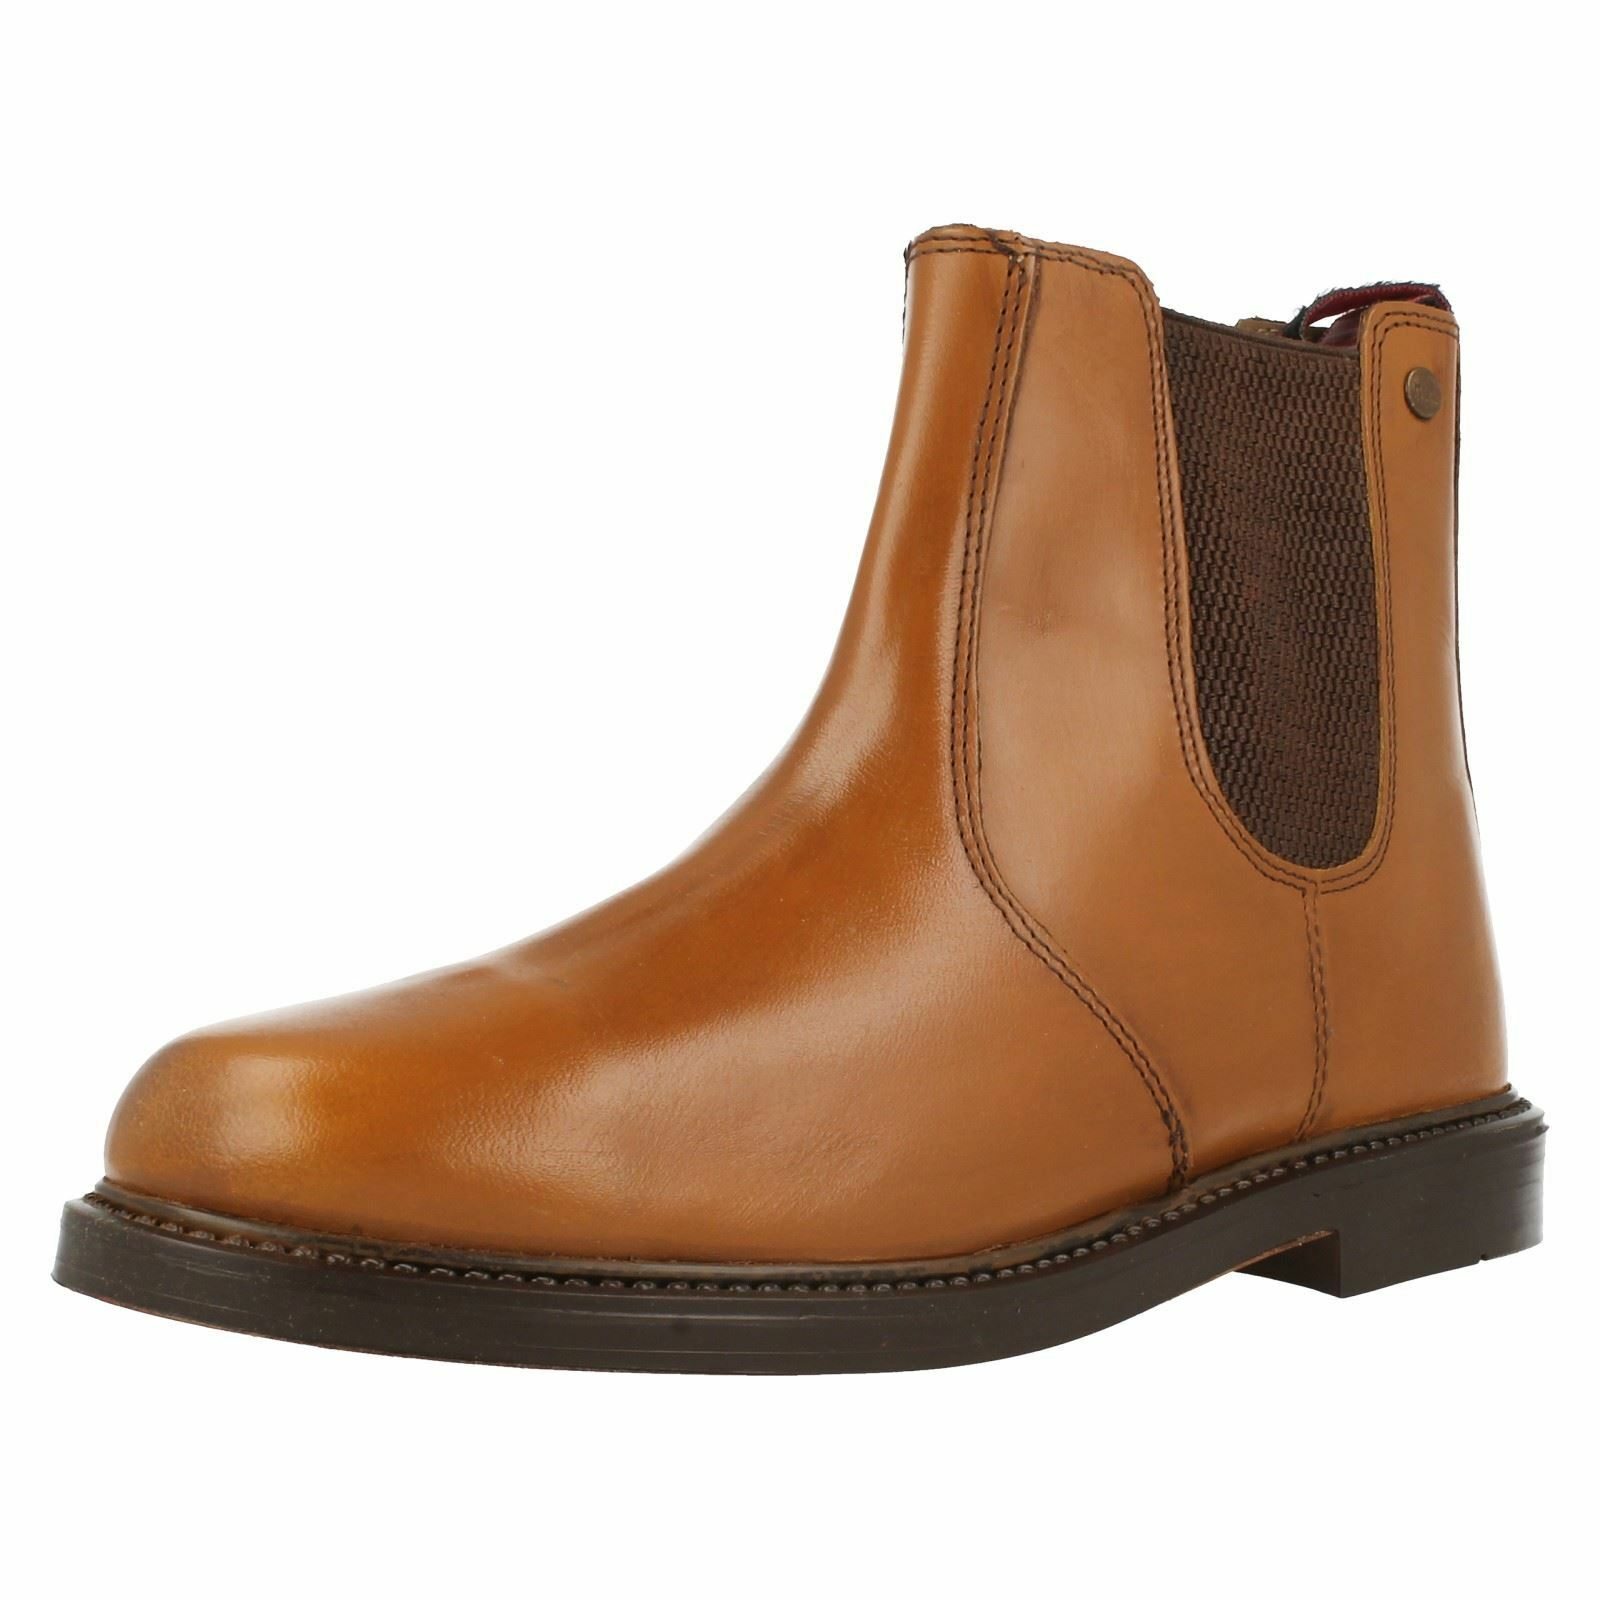 Mens HX London HX05 Tan Leather Chunky Chelsea Boots